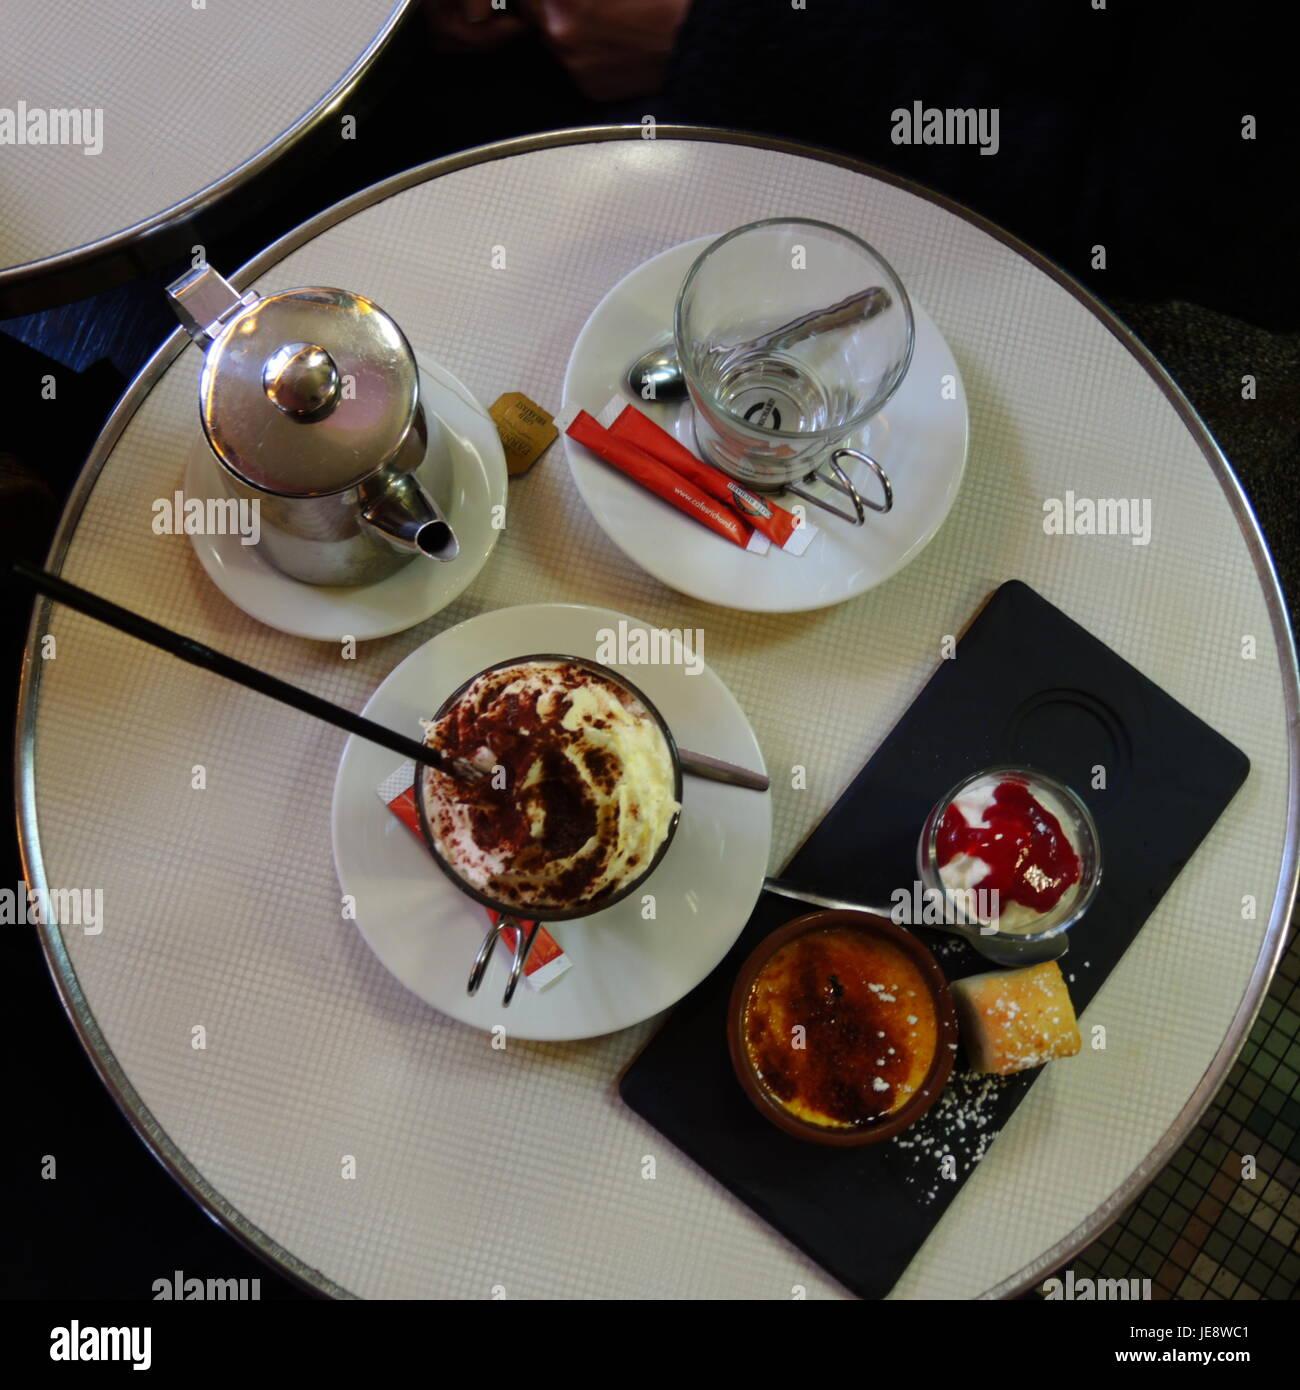 PARIS FRANCE - HOT CHOCOLATE AND TEA WITH PASTRIES AT THE CAFE - PARIS CAFE © NOD PHOTOS Stock Photo